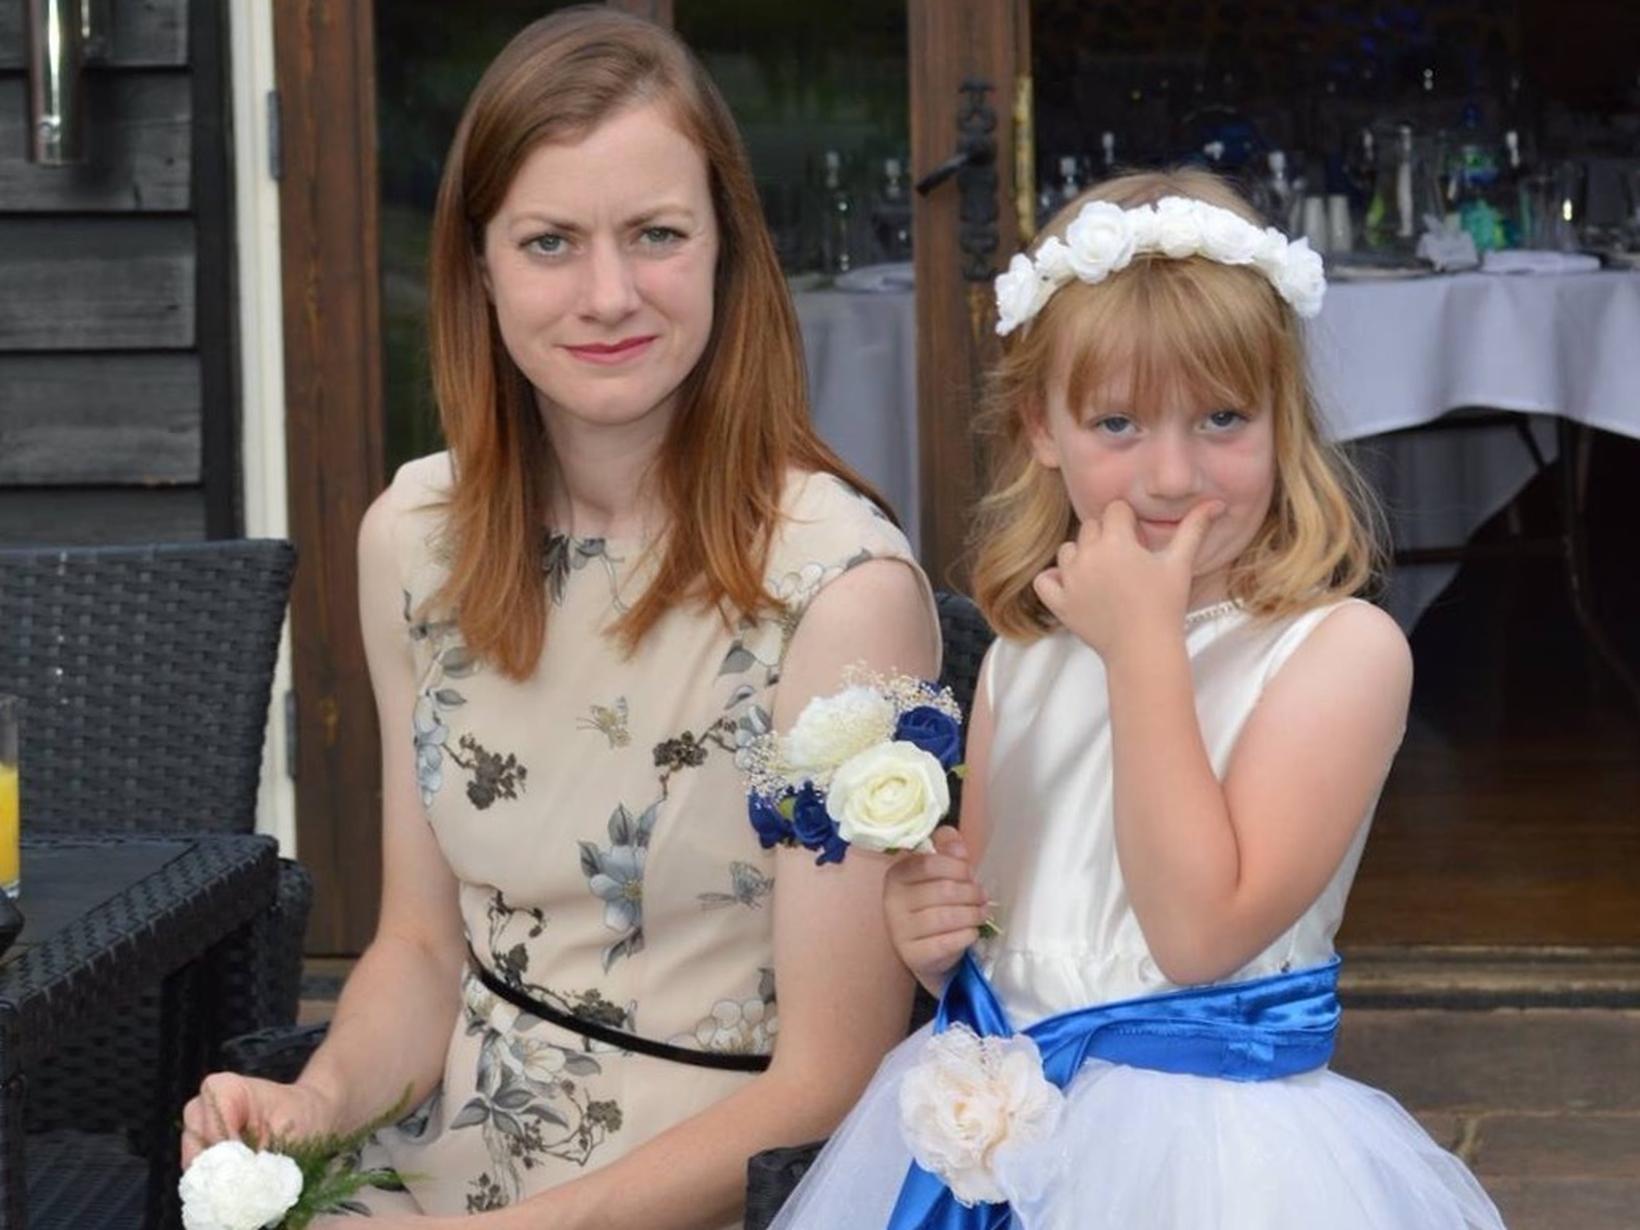 Nicola from Sturmer, United Kingdom